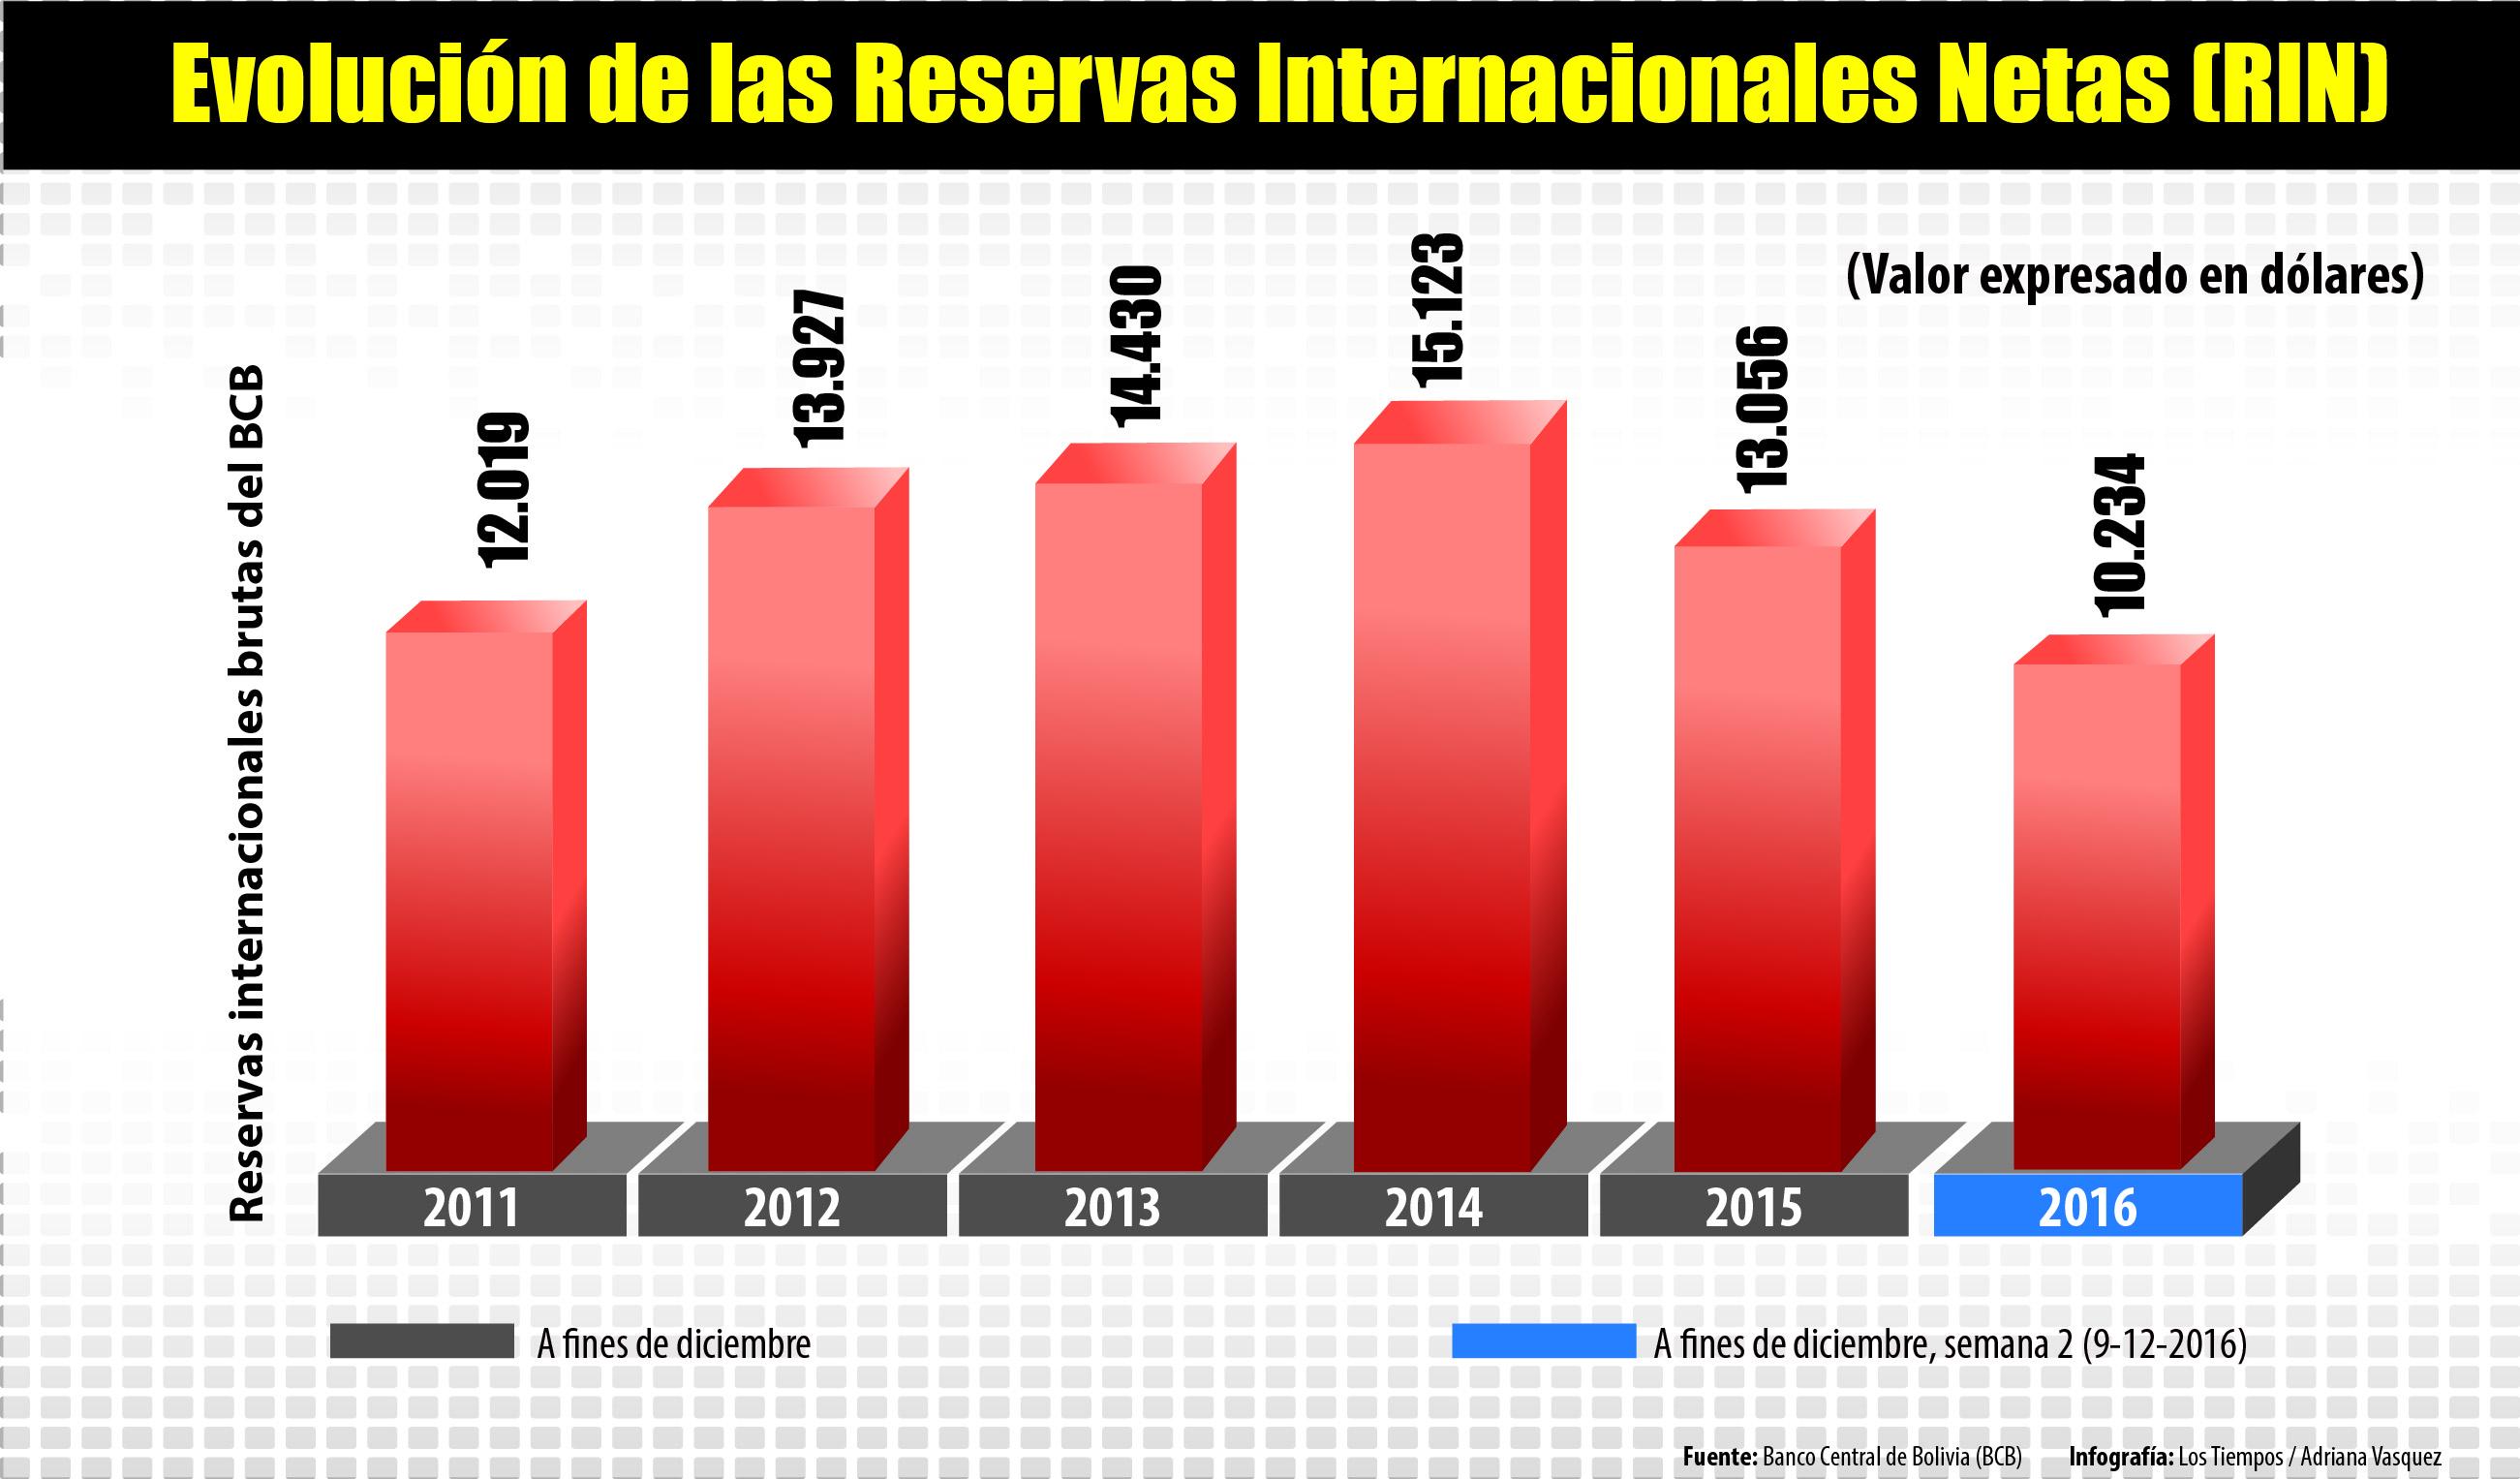 La desaceleraci n econ mica de bolivia seguir en 2017 for Ultimos chimentos dela farandula argentina 2016